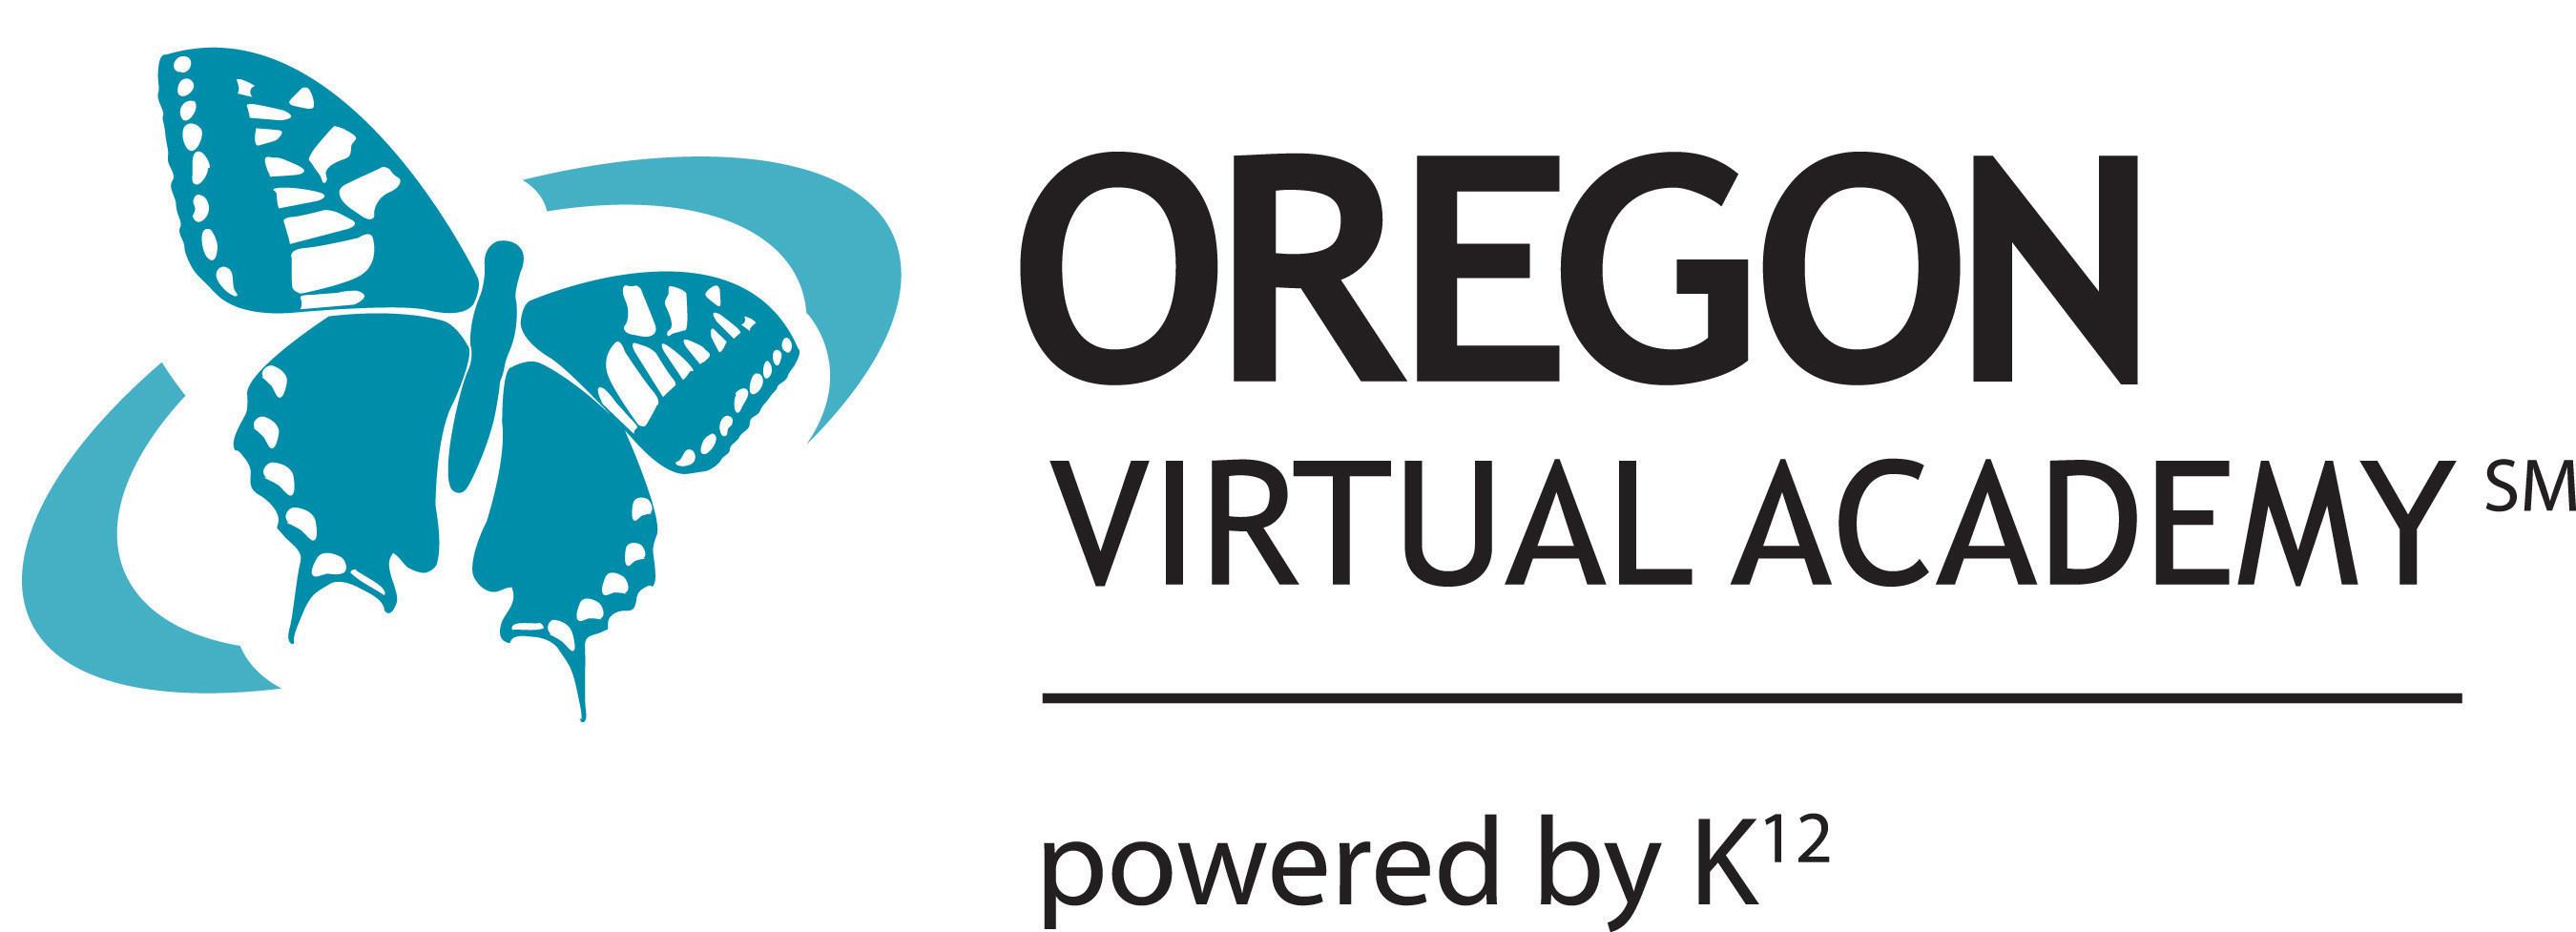 Oregon Virtual Academy